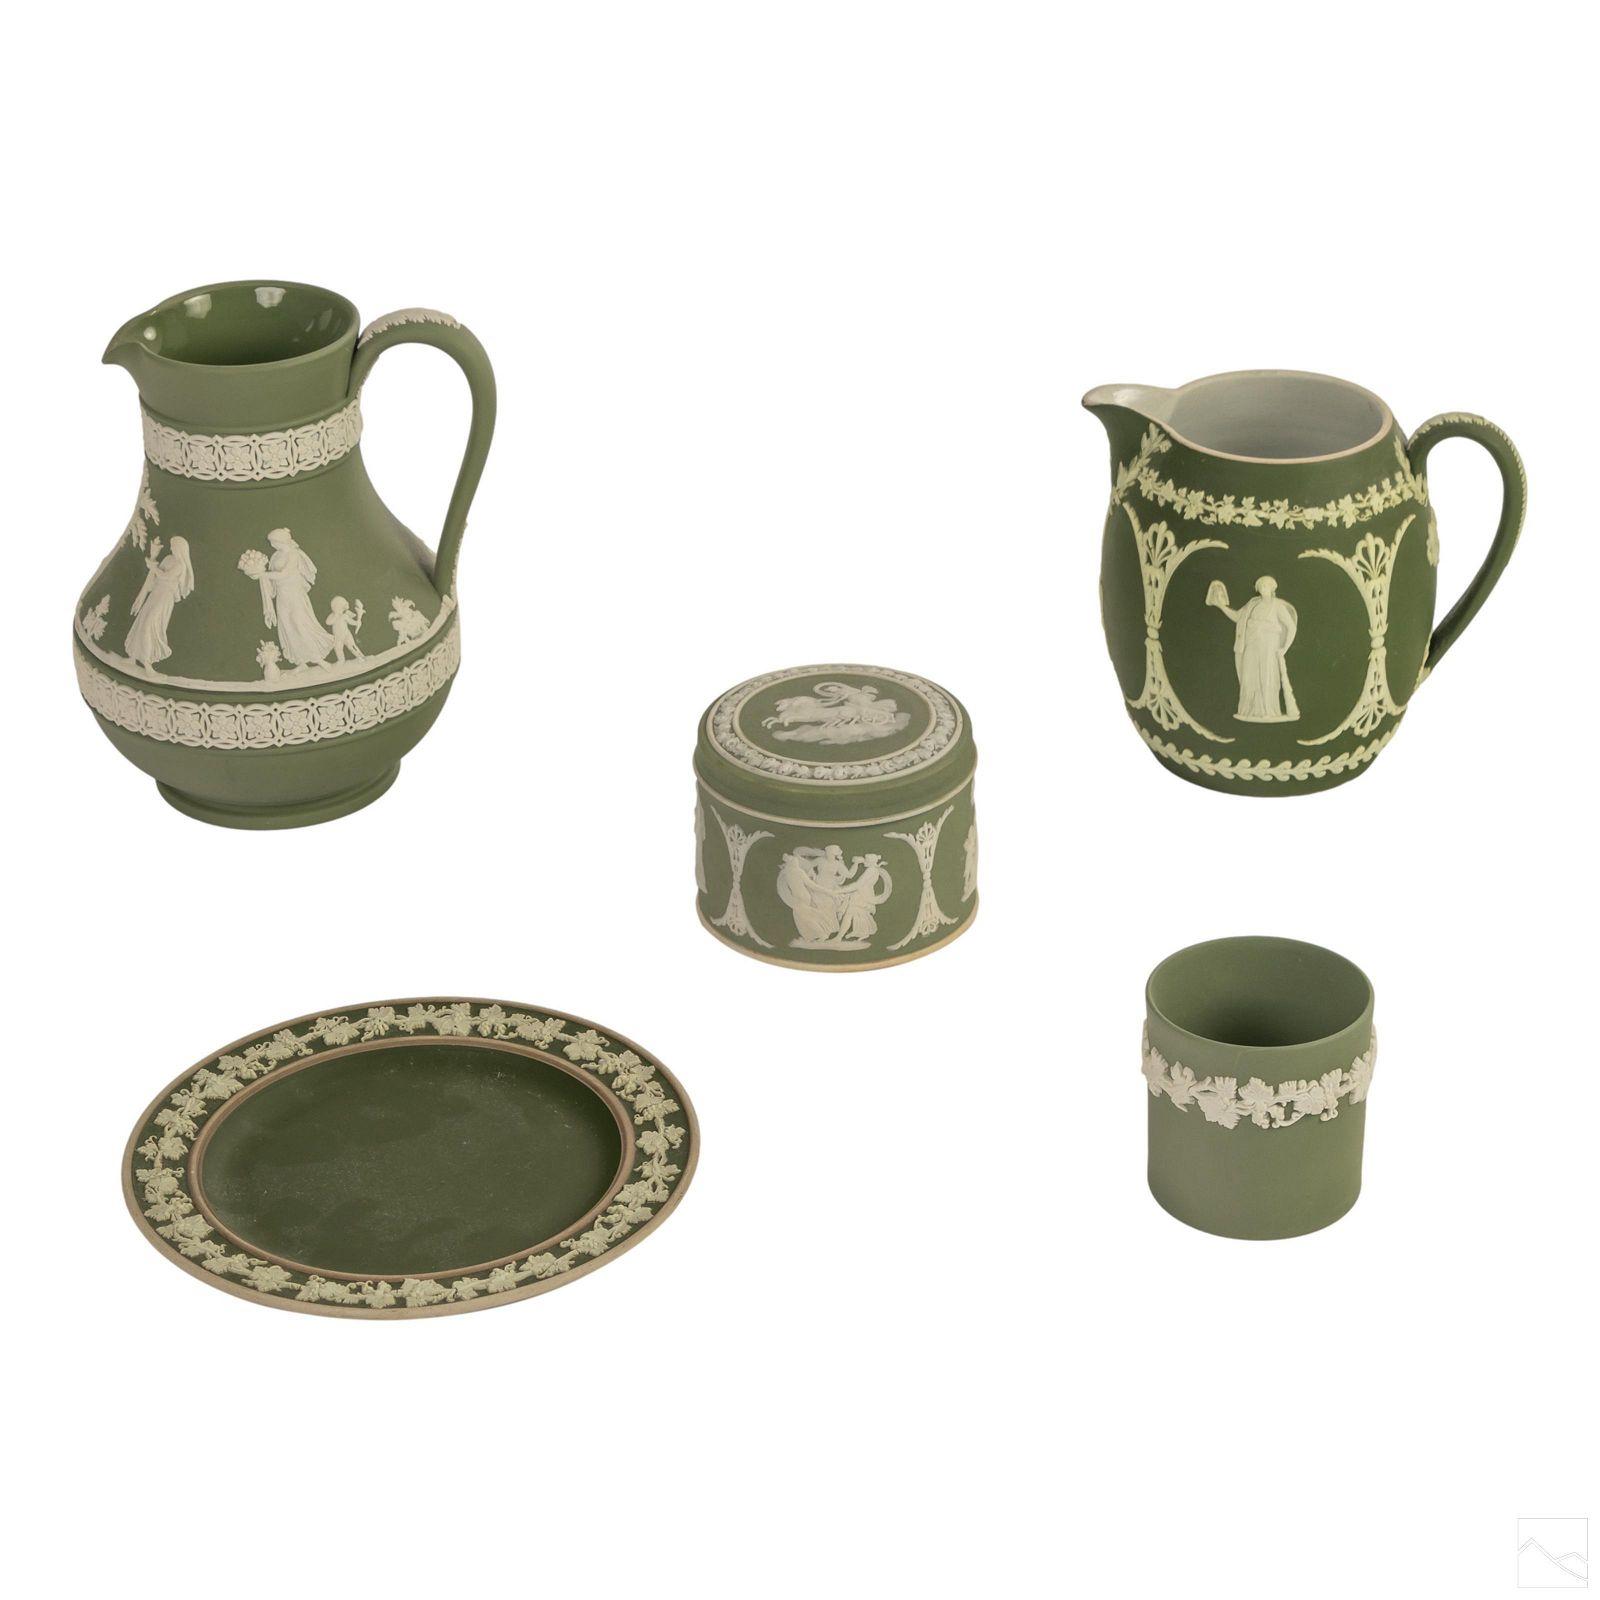 Wedgwood English Green Jasperware Pottery Group